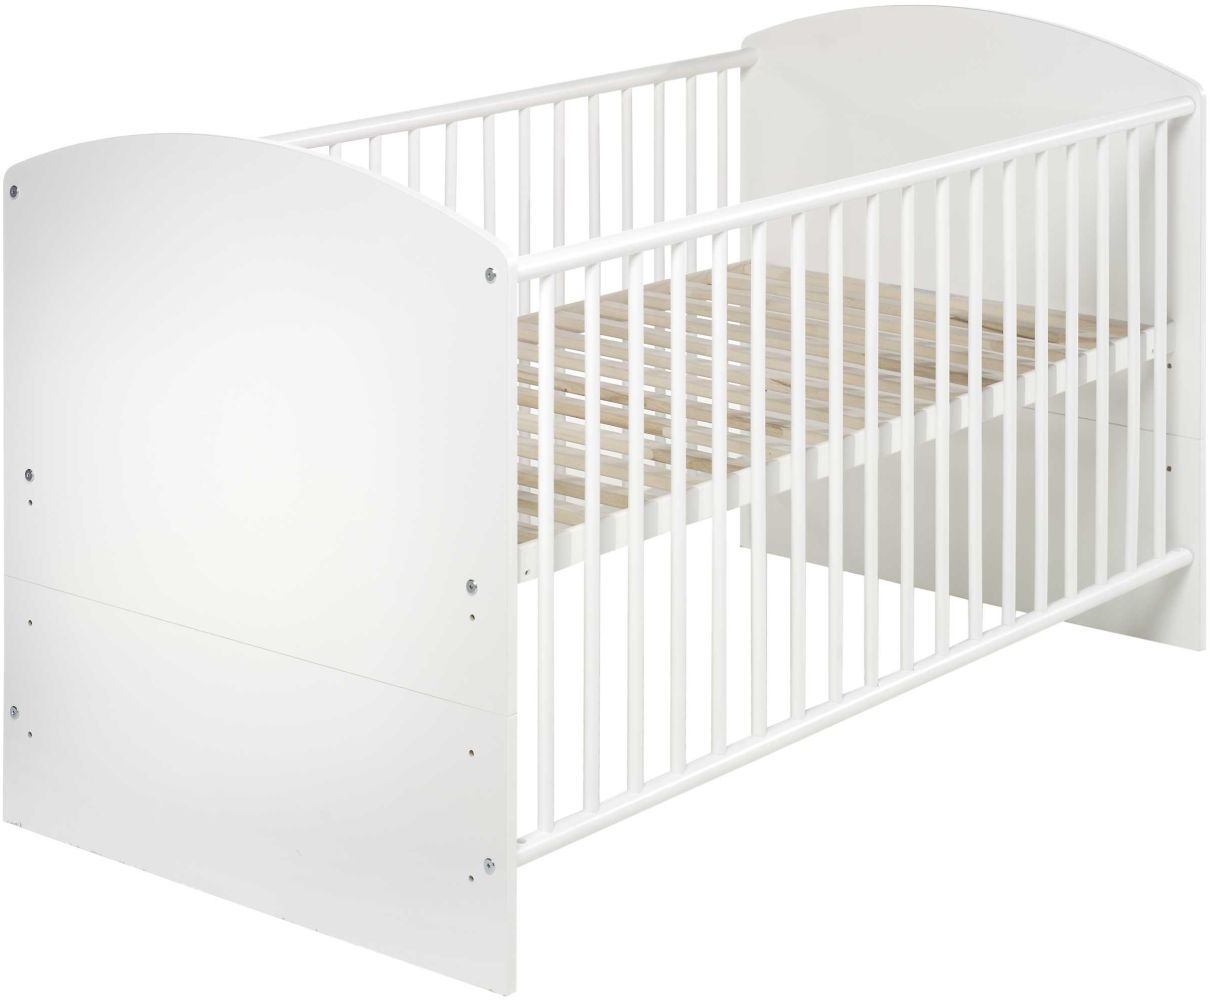 Schardt 'Classic White' Kombi-Kinderbett 70x140 cm weiß Bild 1